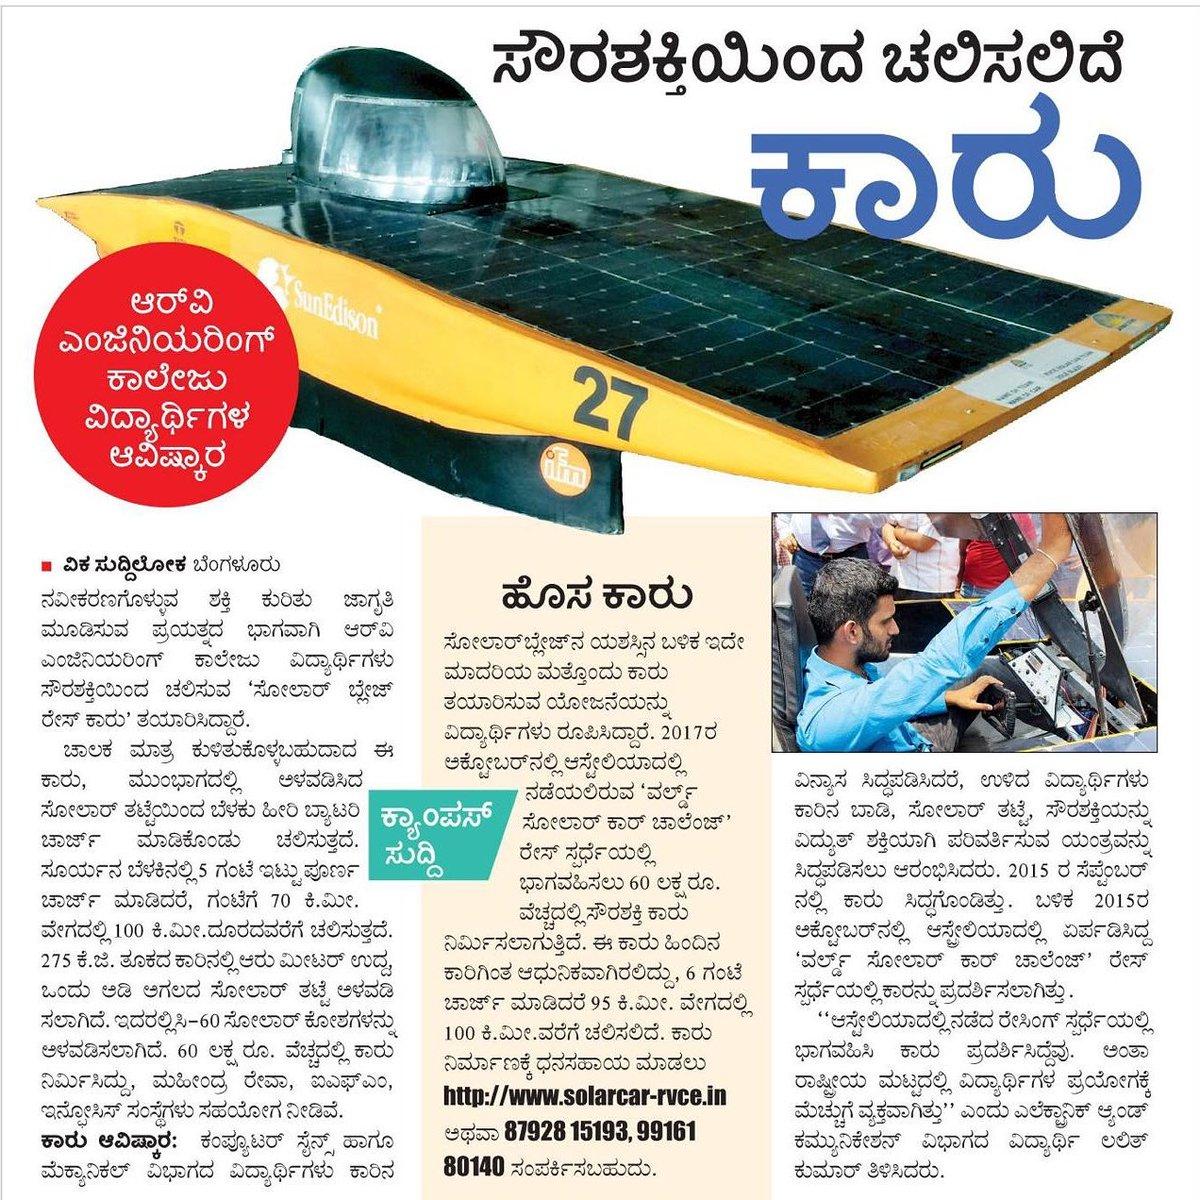 Rvce solar car team on twitter we were featured in the vijaya karnataka news paper it is one of the best newspapers in karnataka